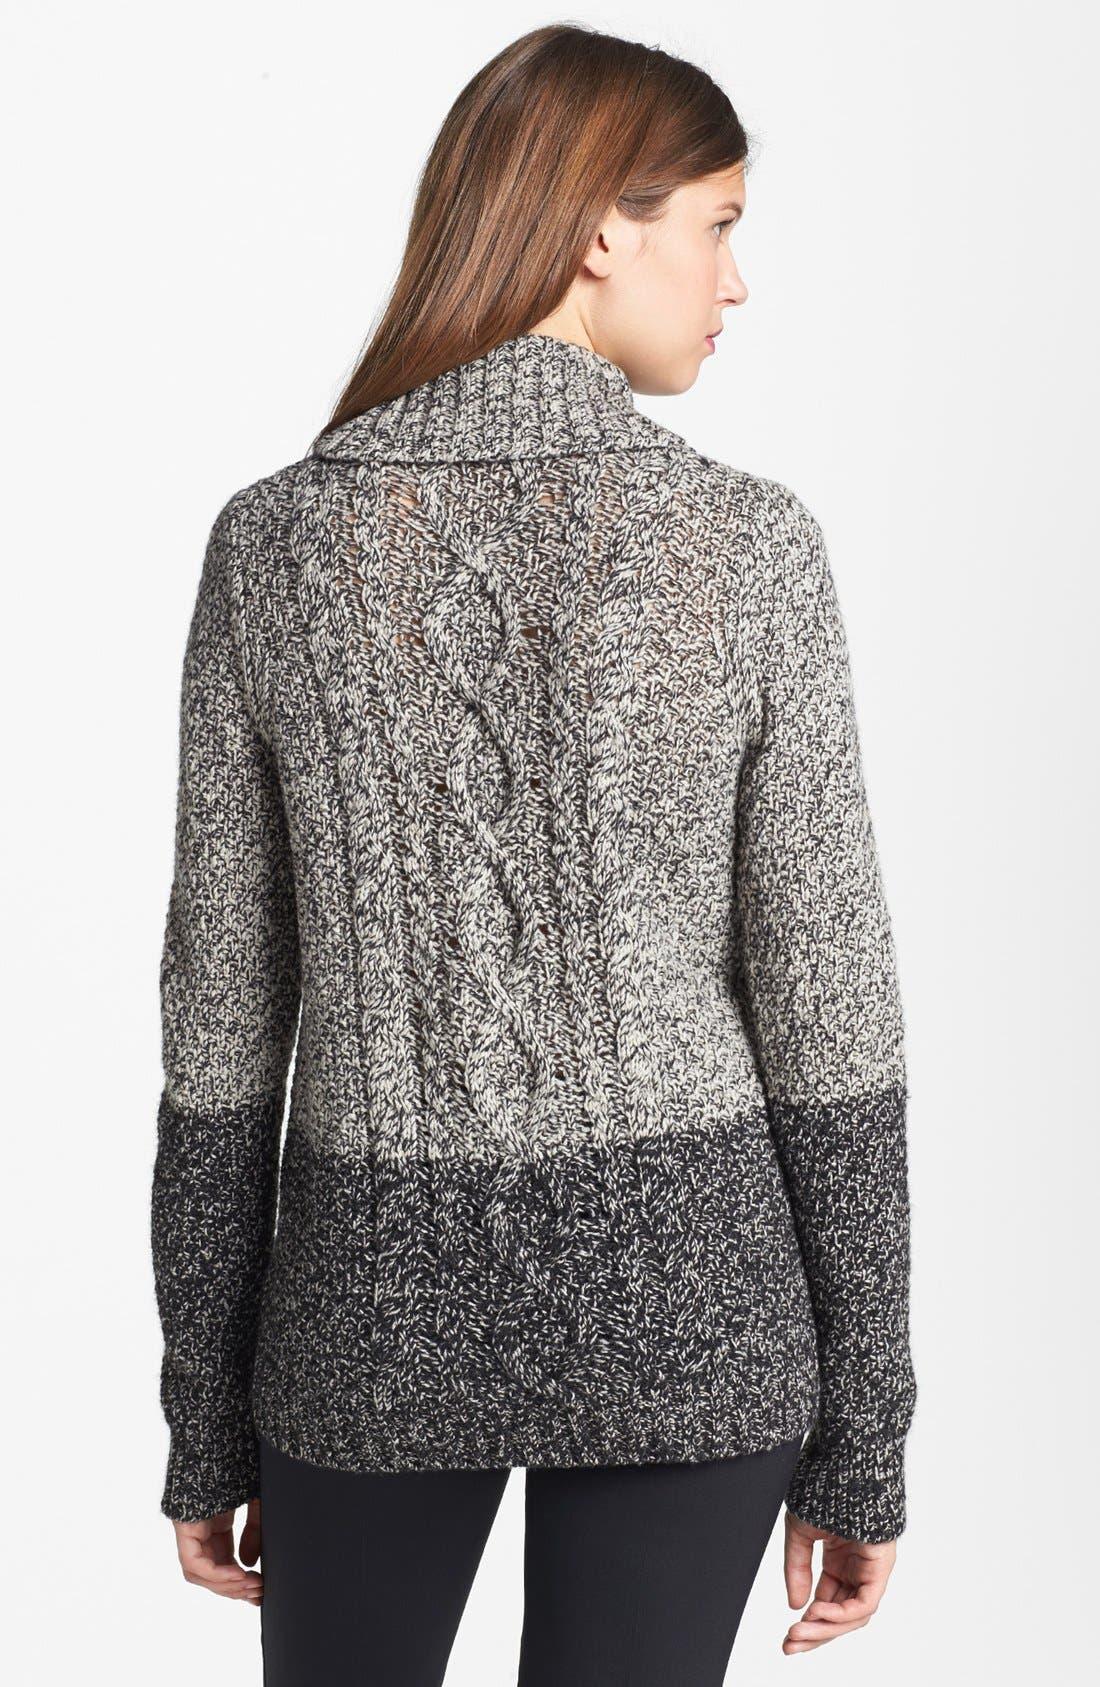 Colorblock Turtleneck Sweater,                             Alternate thumbnail 2, color,                             020